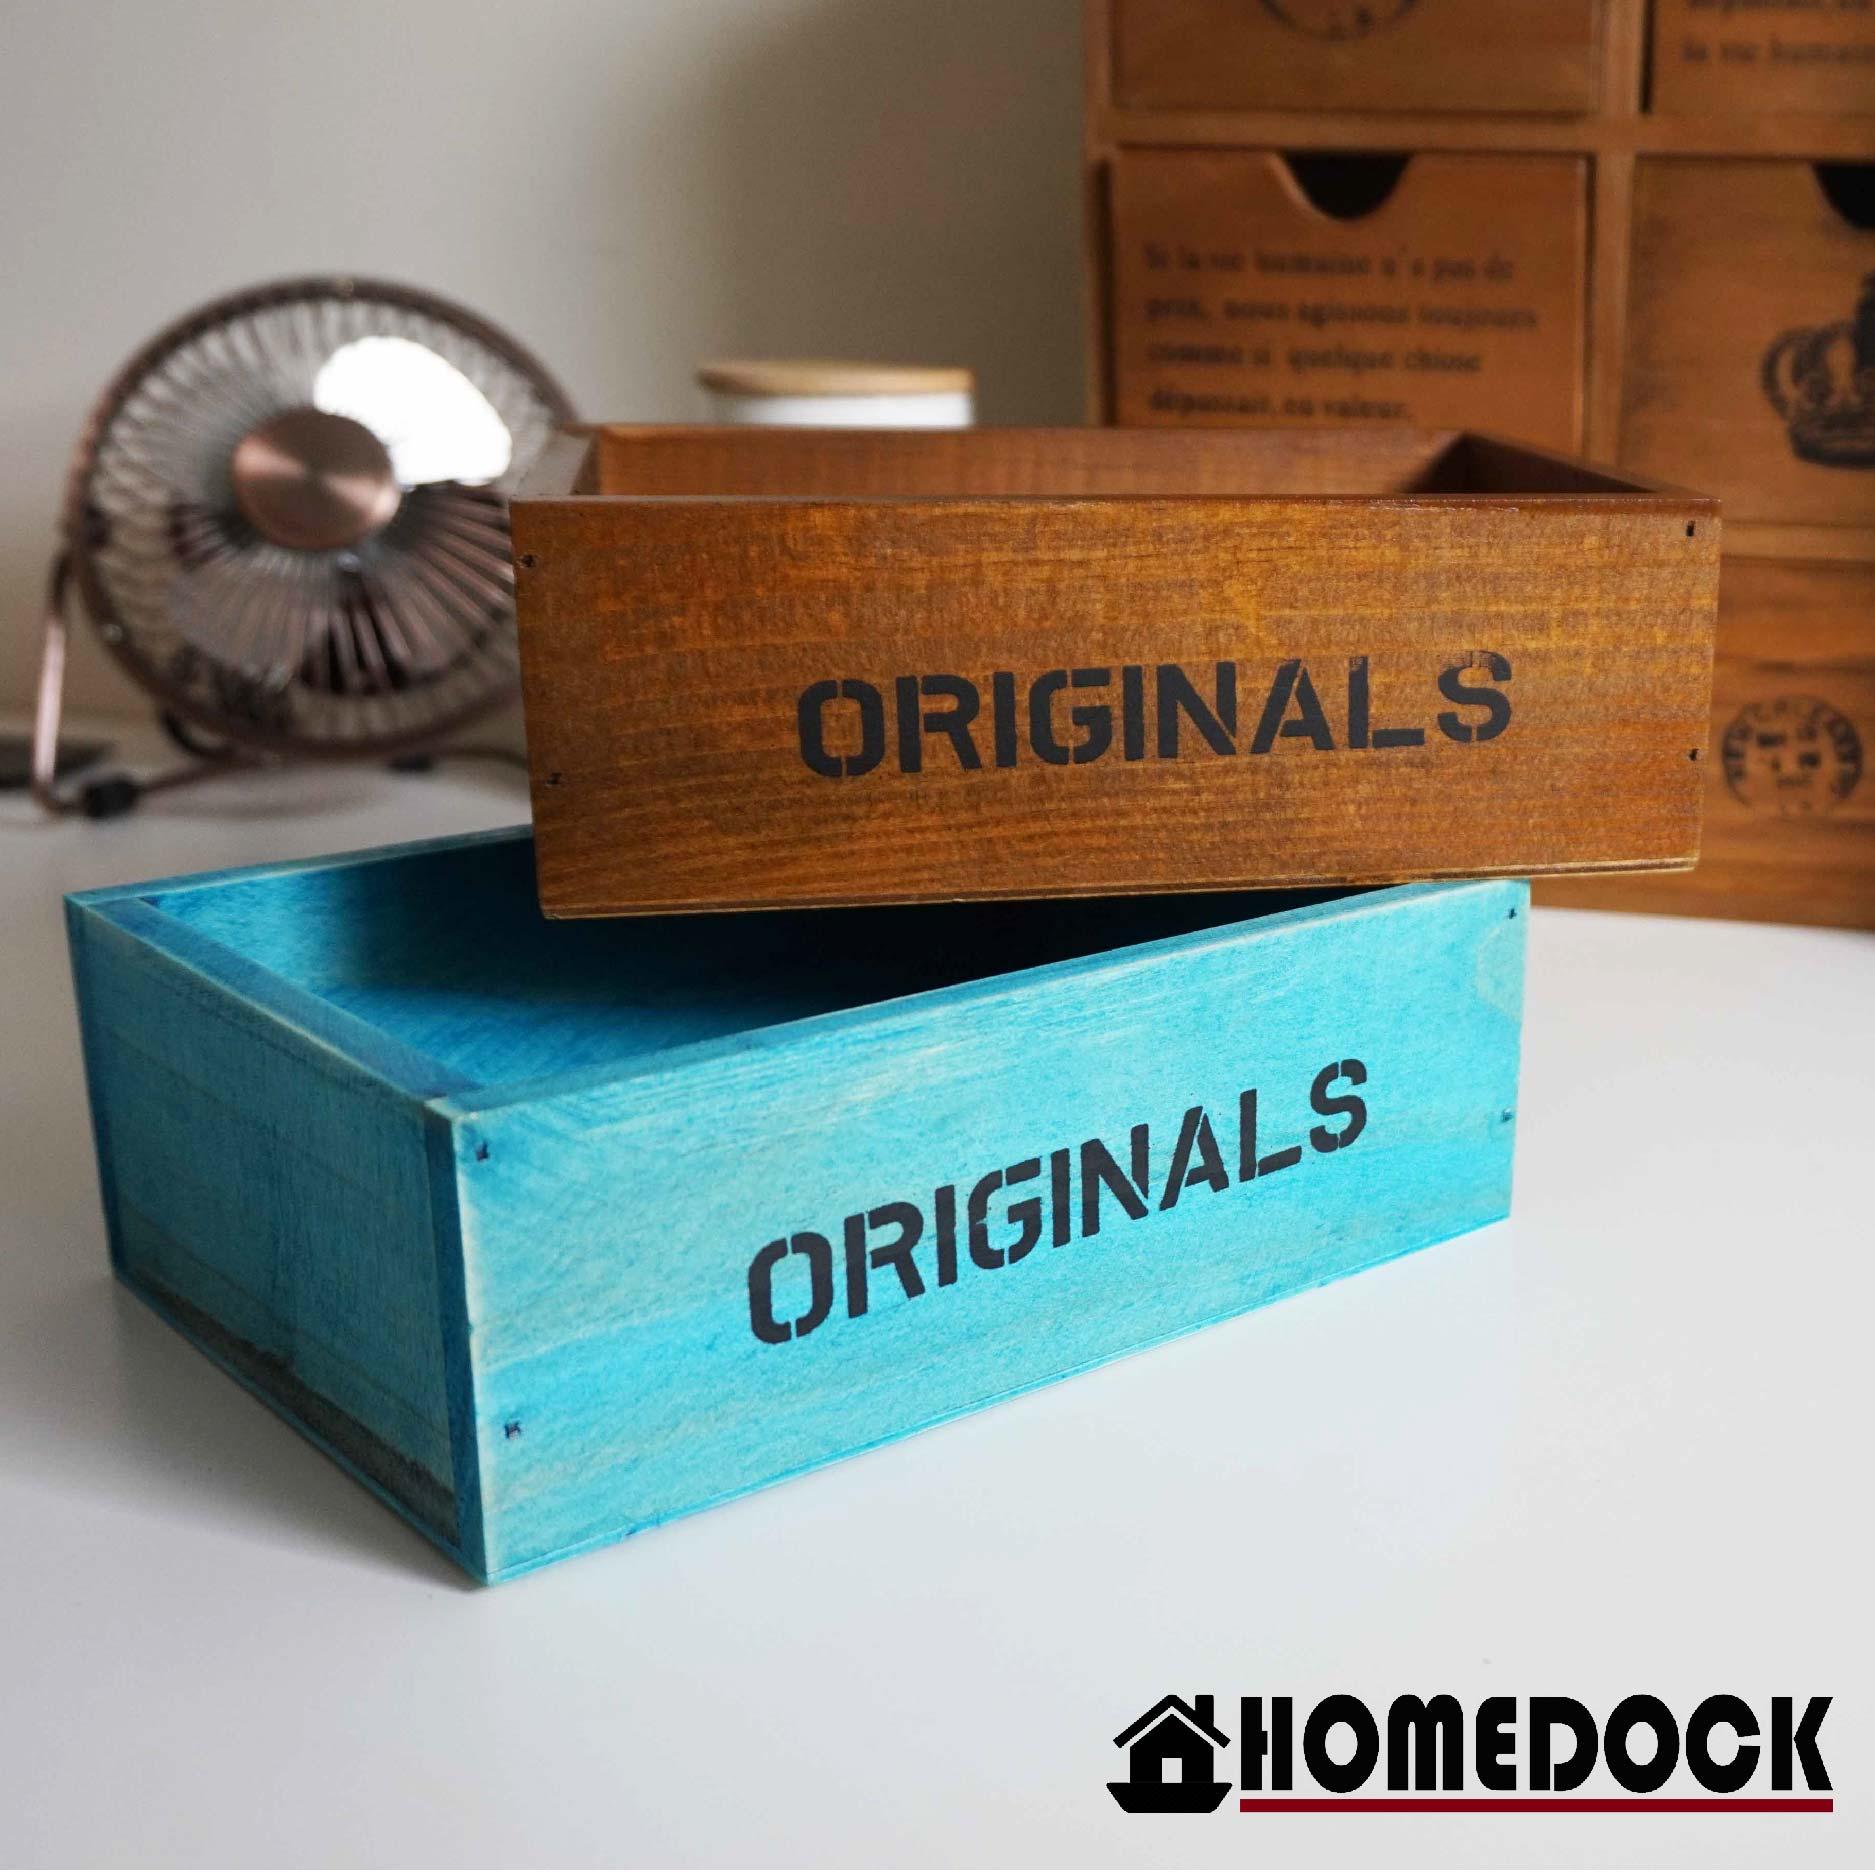 HOMEDOCK-原木質感桌面收納盒 /筆筒/置物盒/Zakka/雜貨/原木製/層格櫃/文具筒/雙層